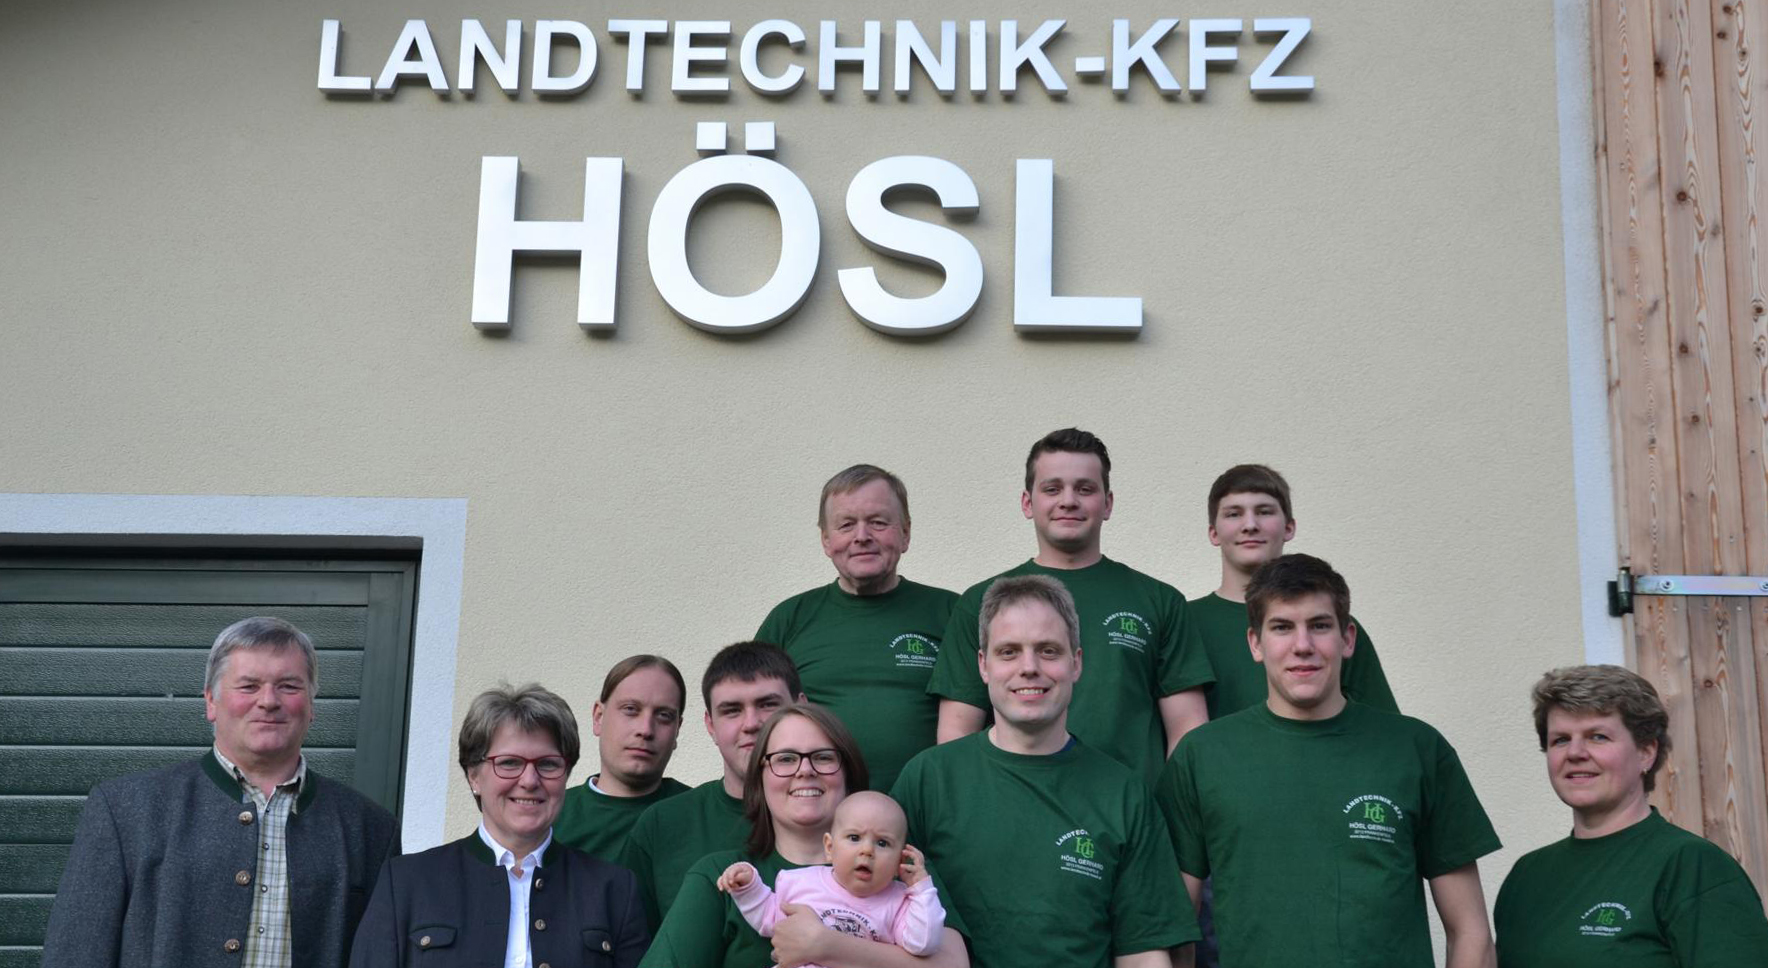 team hösl landtechnik frankenfels